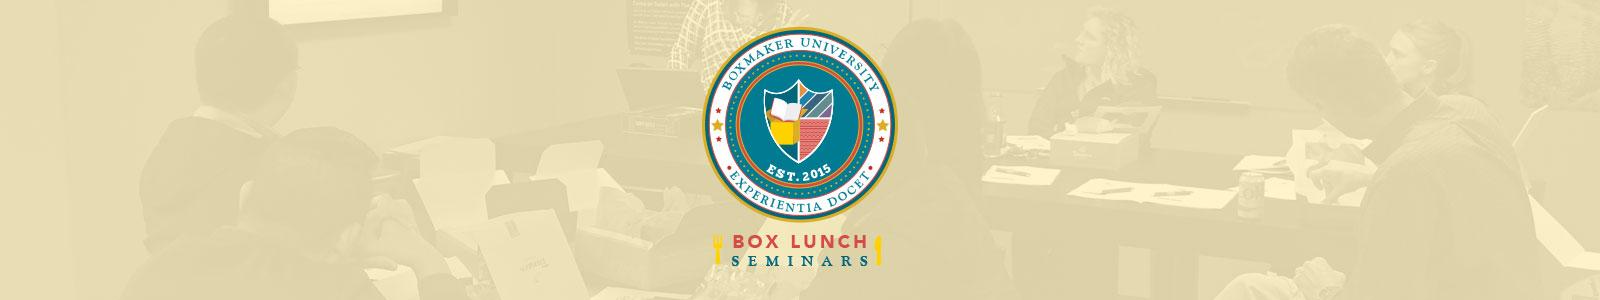 BoxMaker University Banner